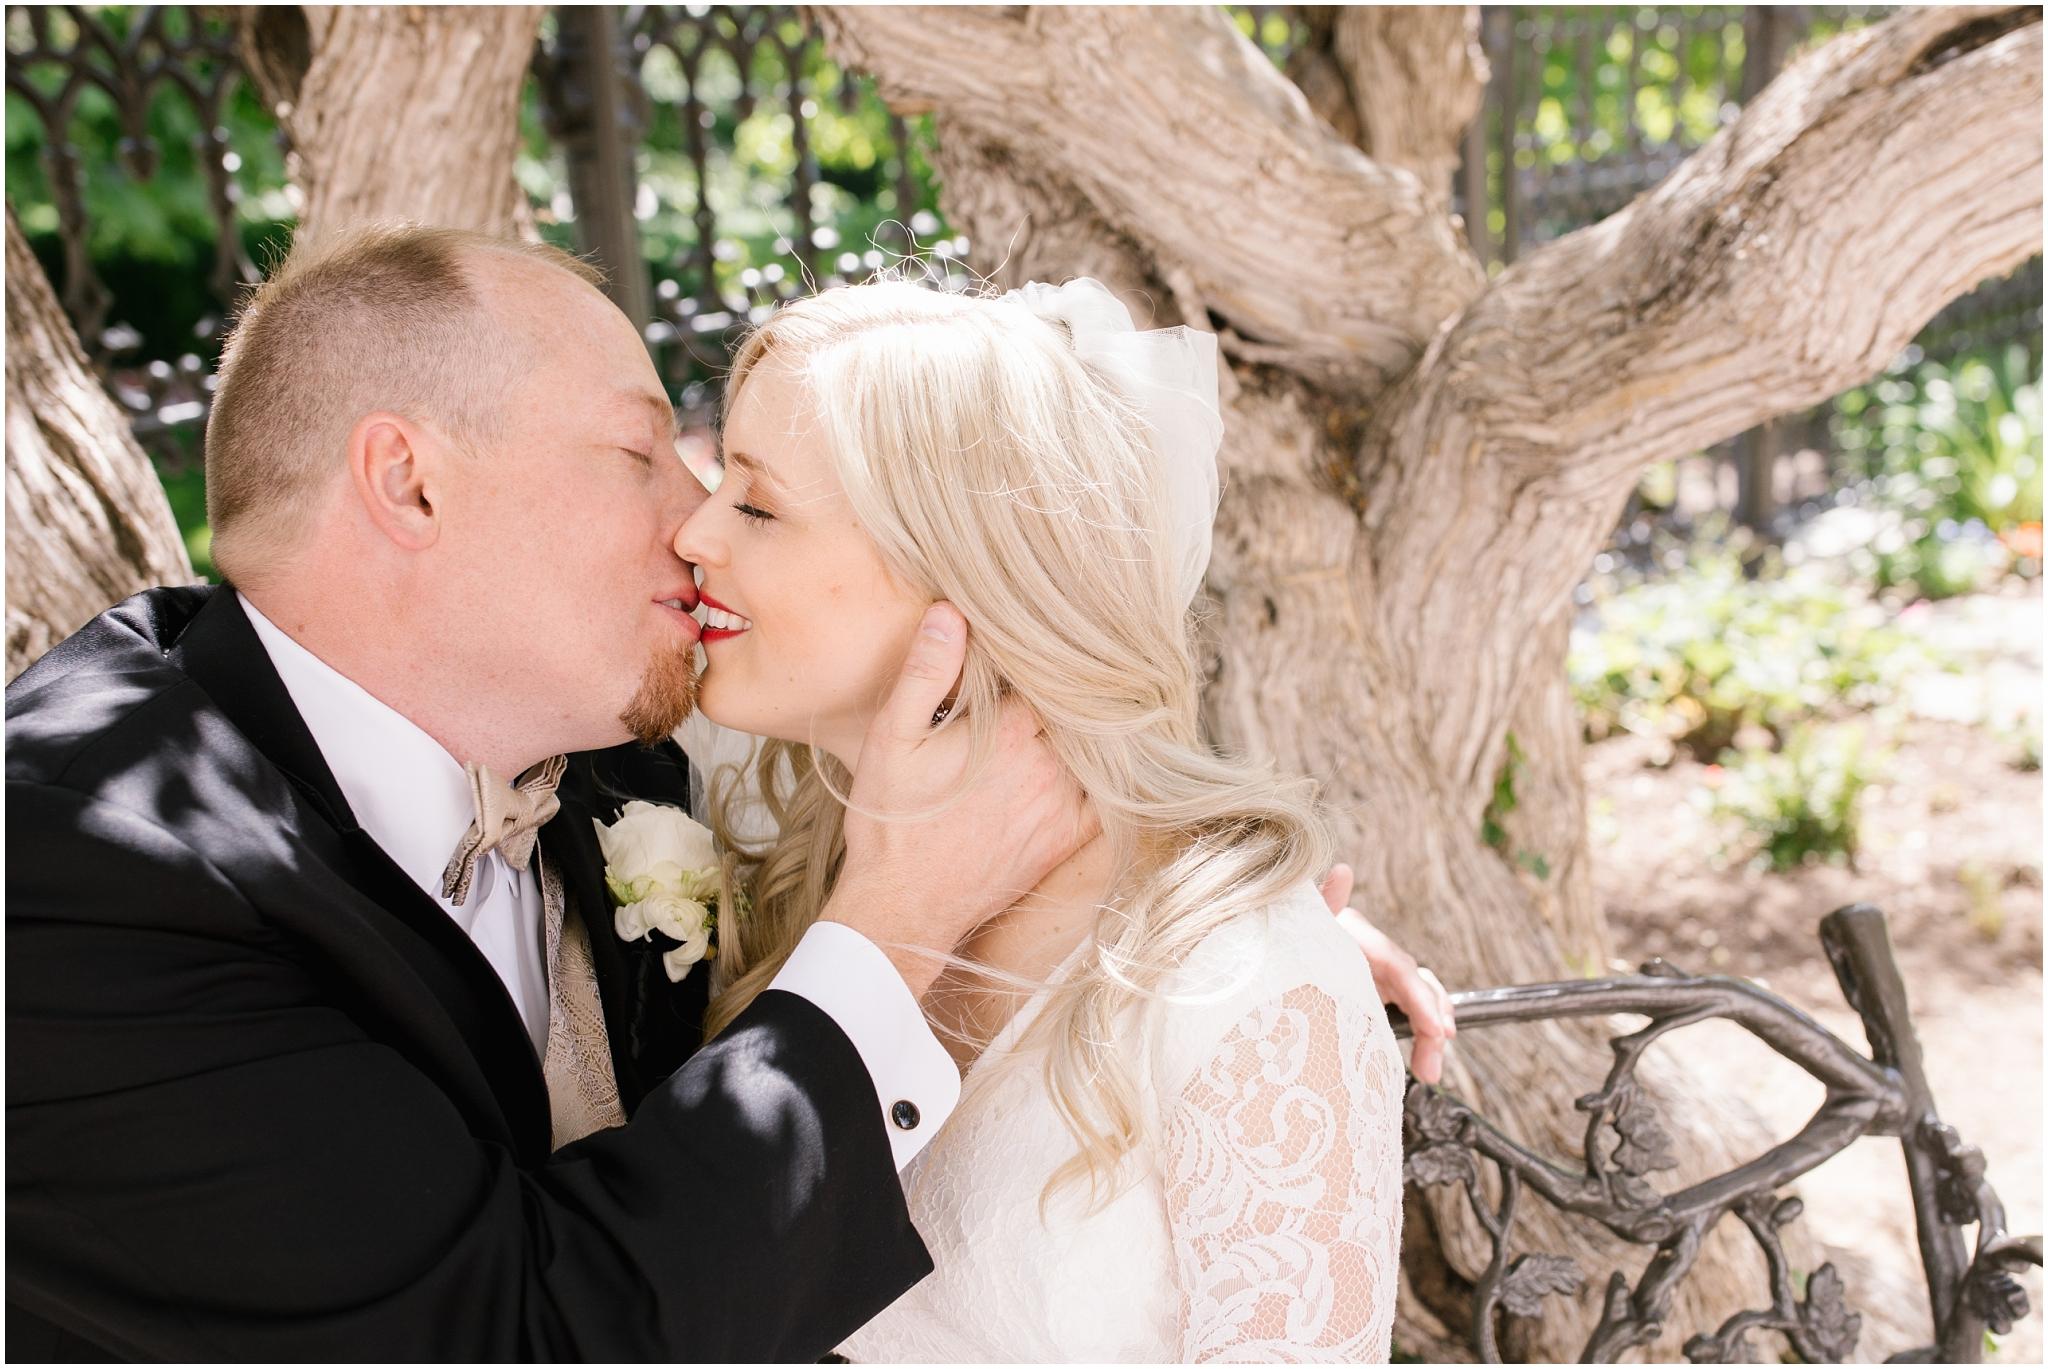 CherylandTyler-201_Lizzie-B-Imagery-Utah-Wedding-Photographer-Salt-Lake-City-Temple-Wells-Fargo-Building-Reception.jpg